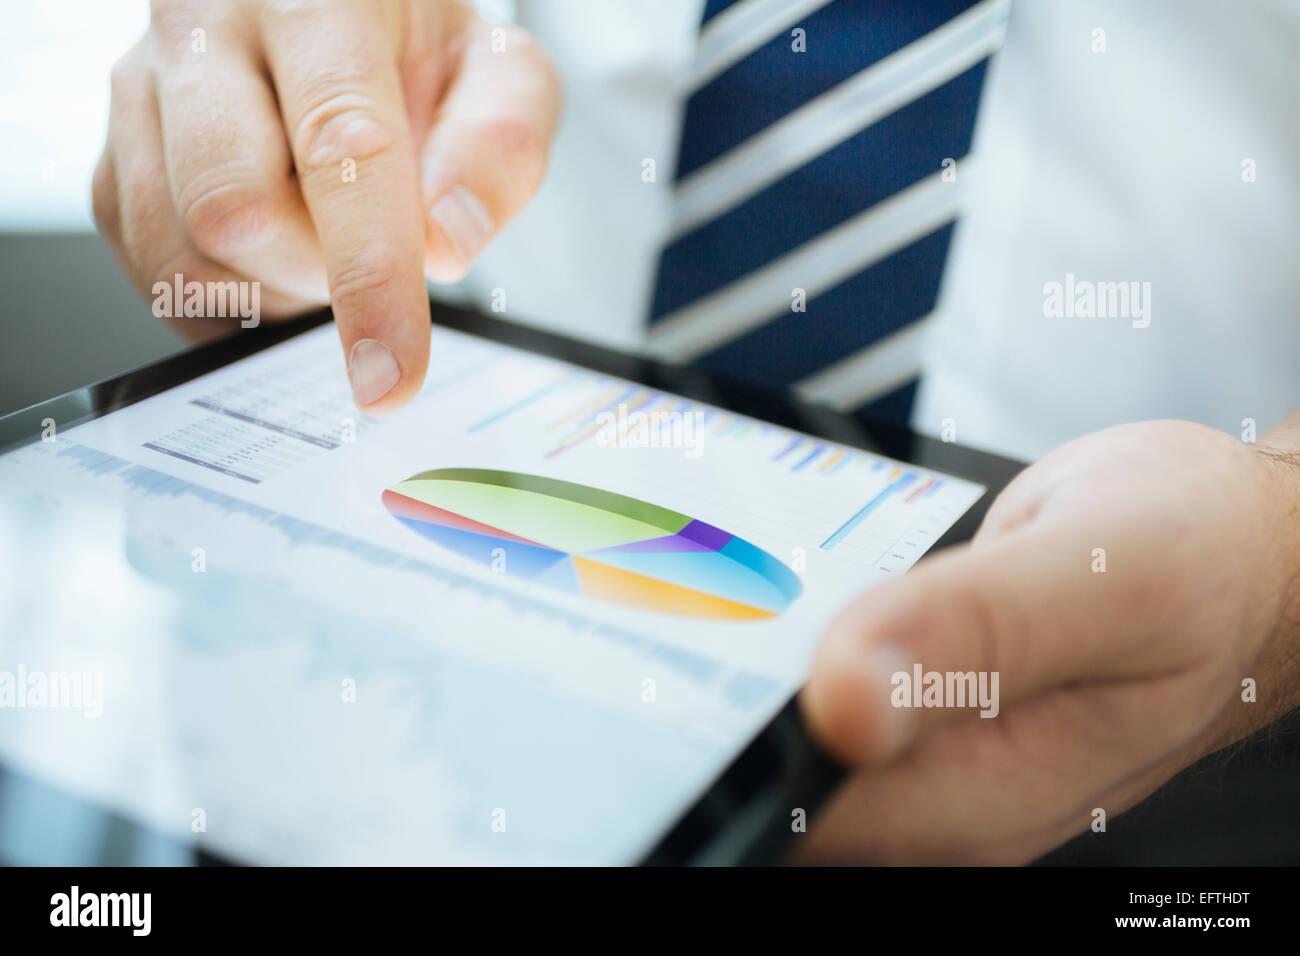 Tableta digital Imagen De Stock